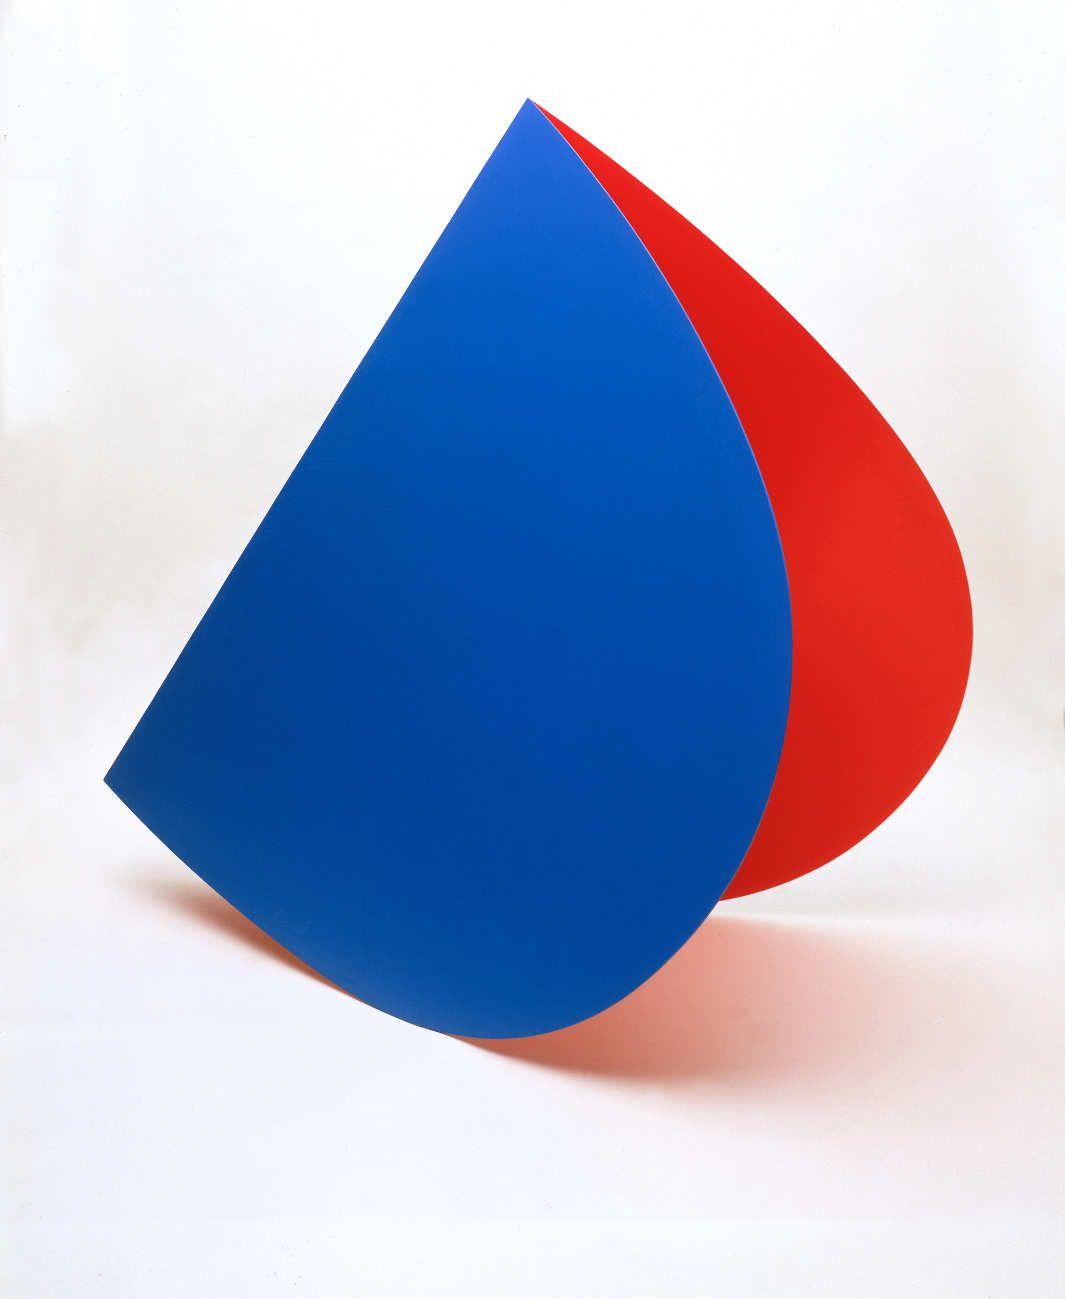 Ellsworth Kelly, Blue Red Rocker, 1963, Bemaltes Aluminium, 185 x 101 x 155 cm, Collection Stedelijk Museum Amsterdam © Estate of the artist, Collection Stedelijk Museum Amsterdam© Ellsworth Kelly.